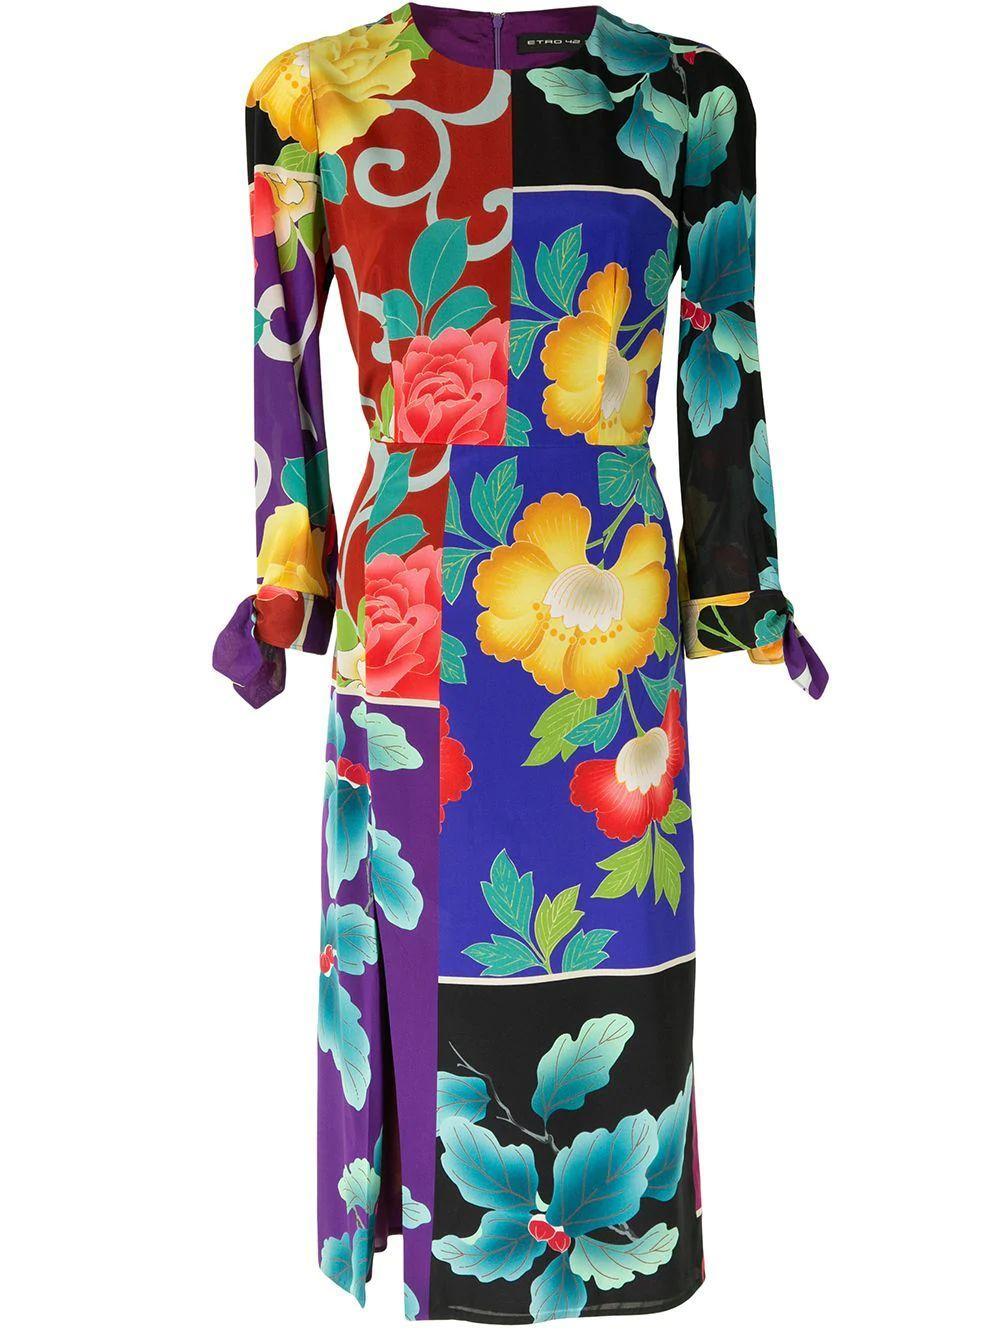 Melissa Printed Dress Item # 13468-4264